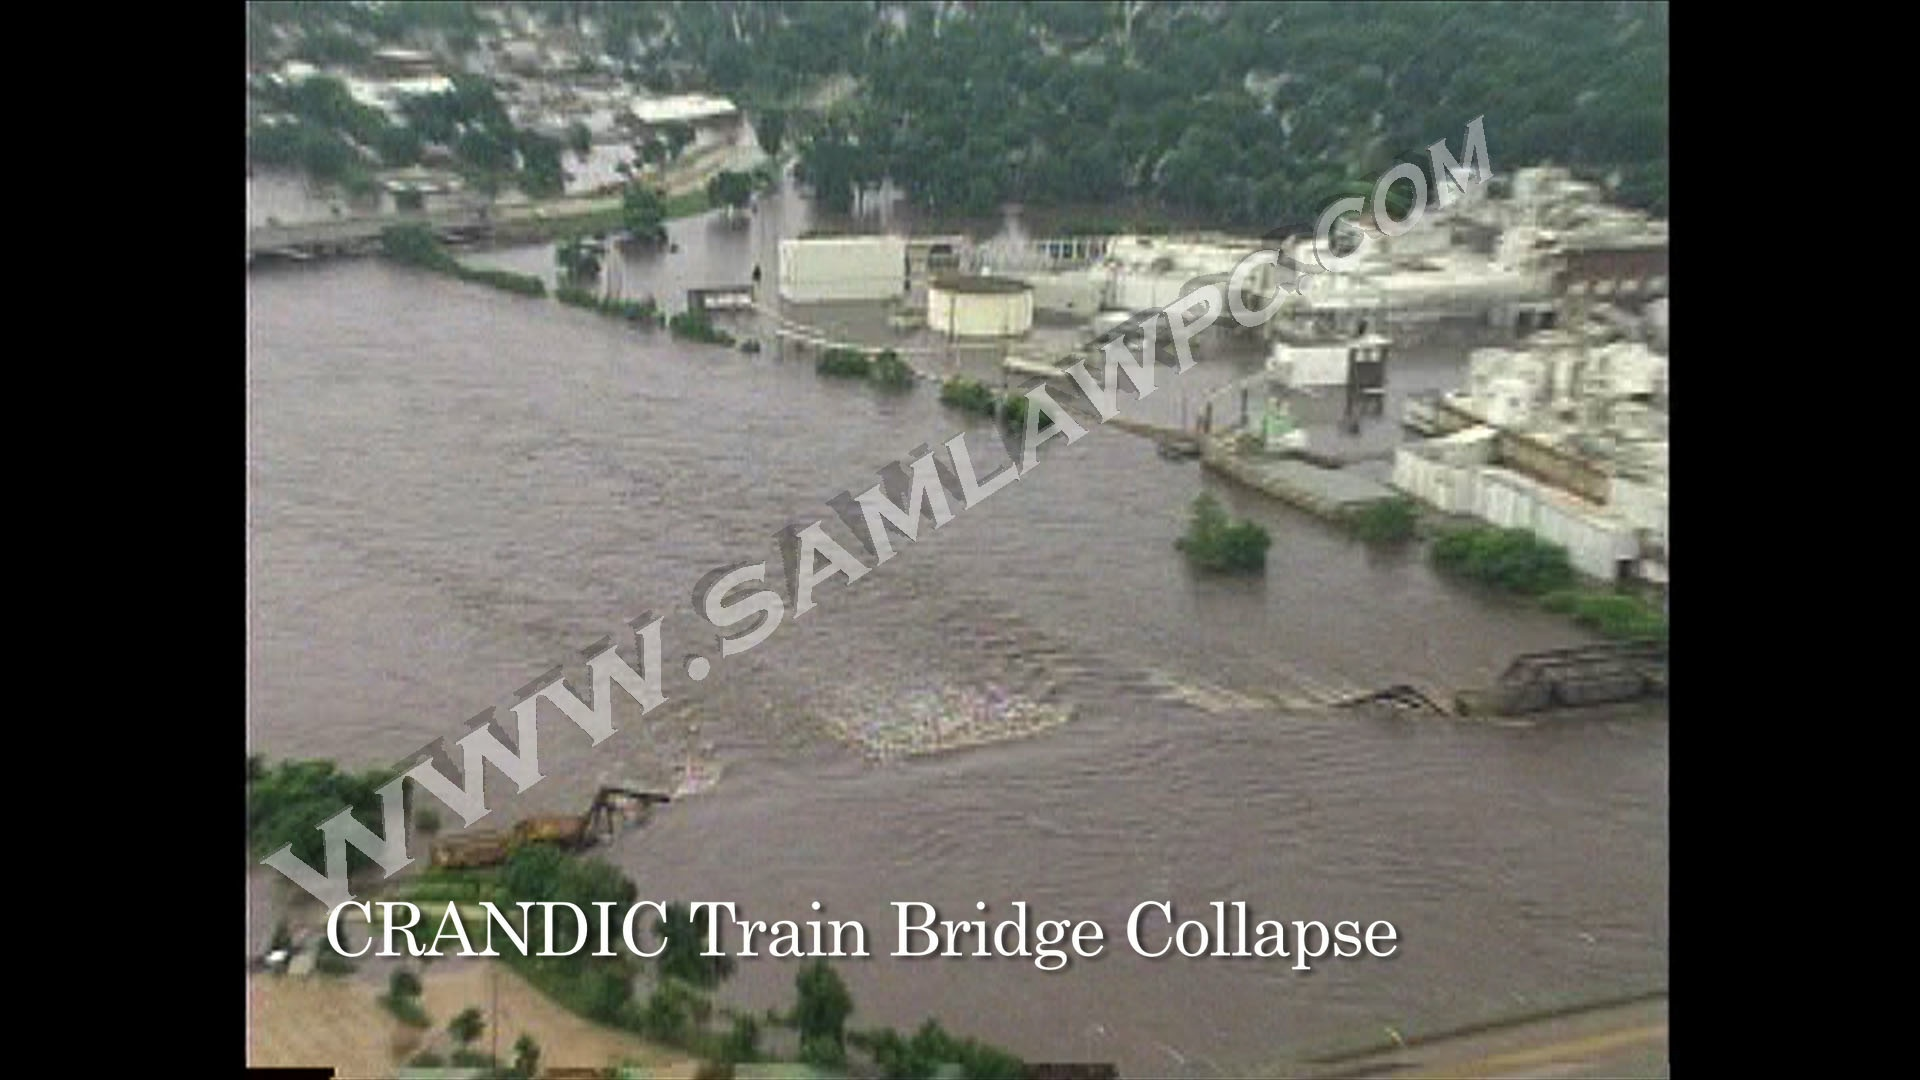 Litigation Over 2008 Rail Bridges Collapse Makes it to the U.S. Supreme Court